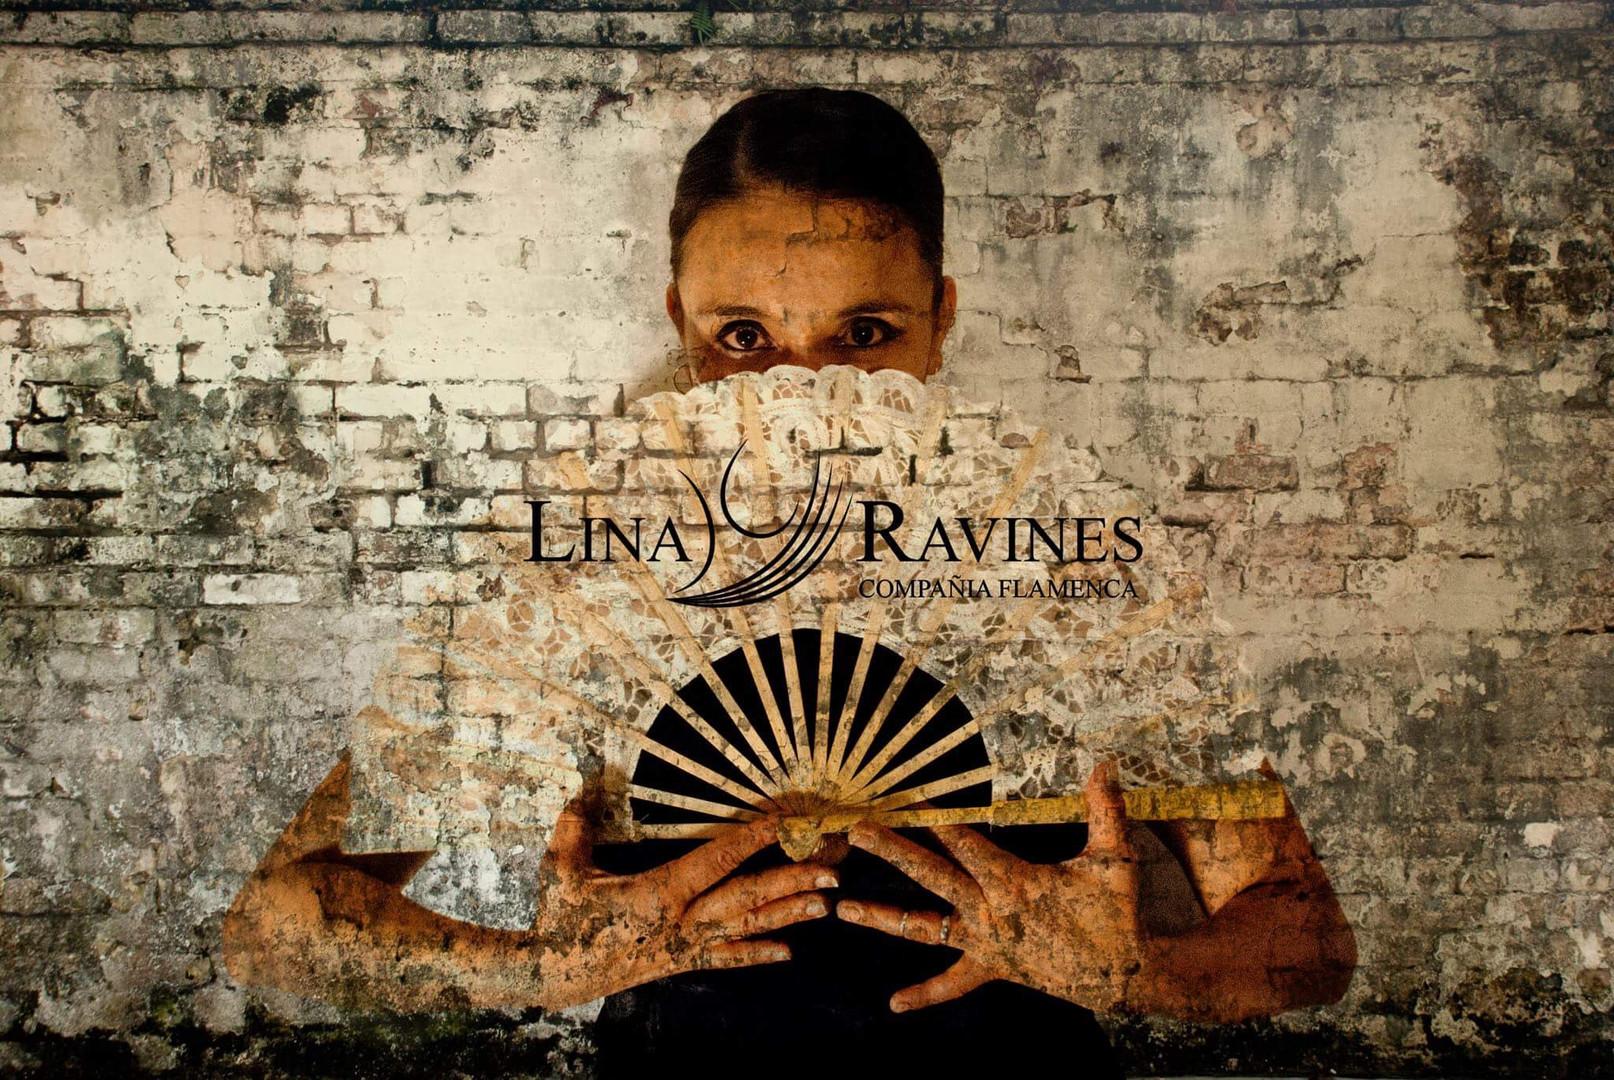 LINA RAVINES COMPAÑIA FLAMENCA